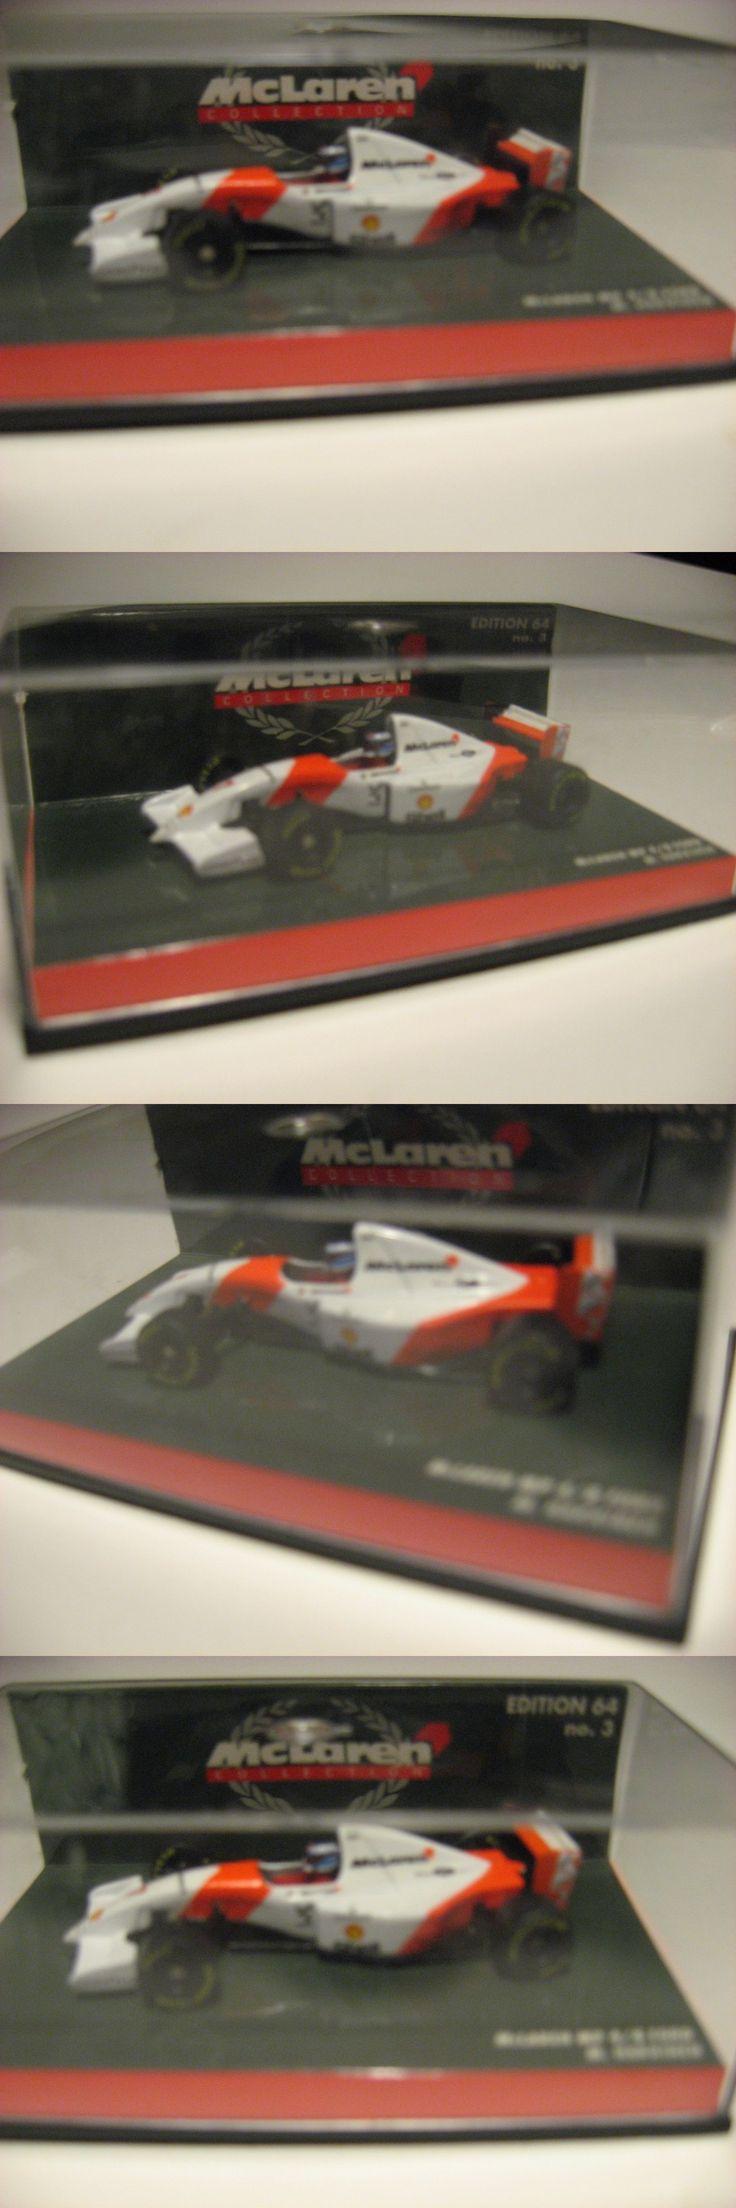 Formula 1 cars 180270 1993 f1 mclaren mp4 8 ford mika hakkinen minichamps 1